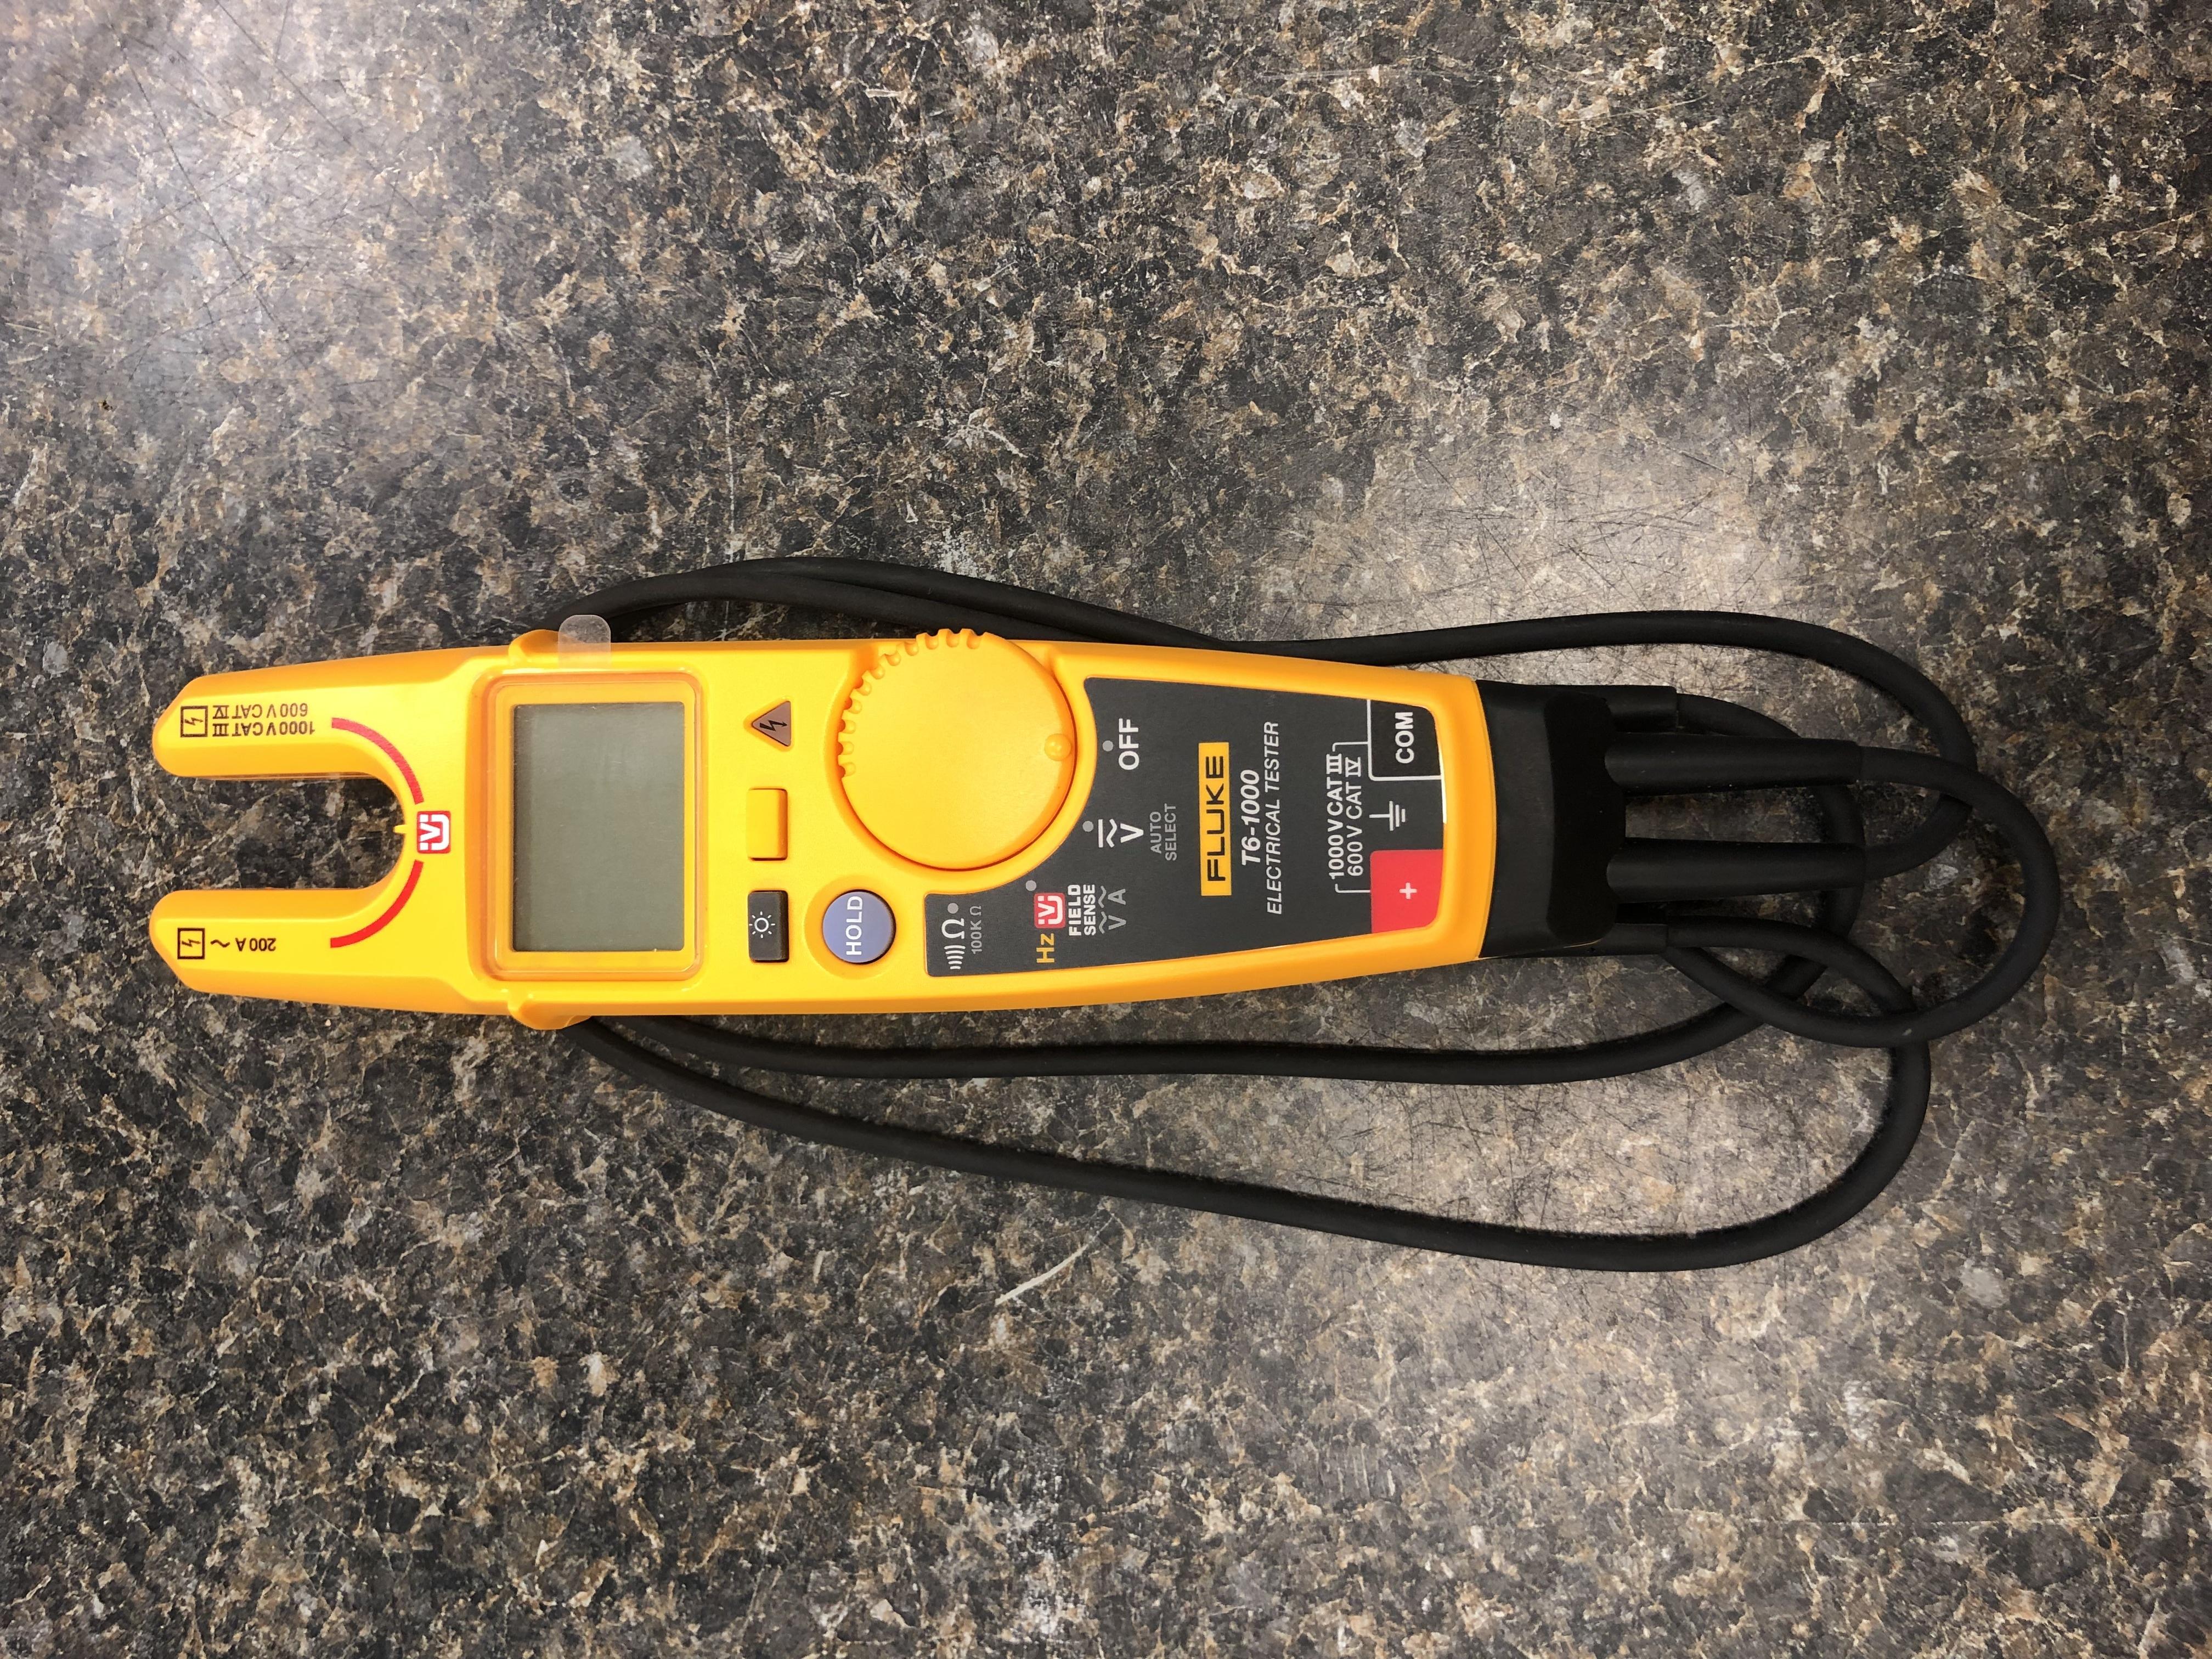 Fluke Electrical Tester w/ probes - T6-1000